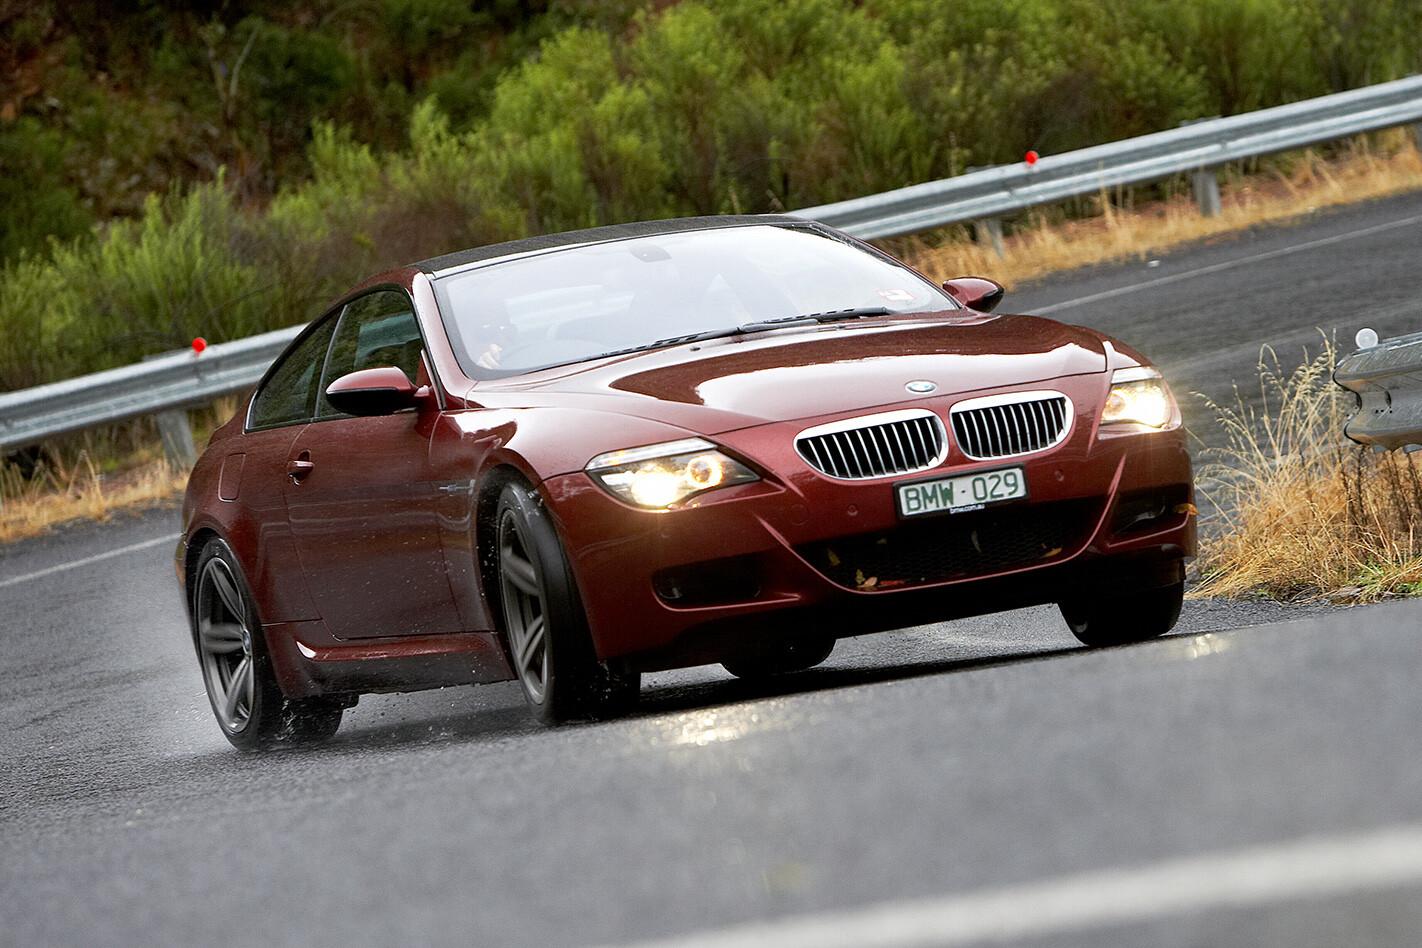 2008 BMW M6 front